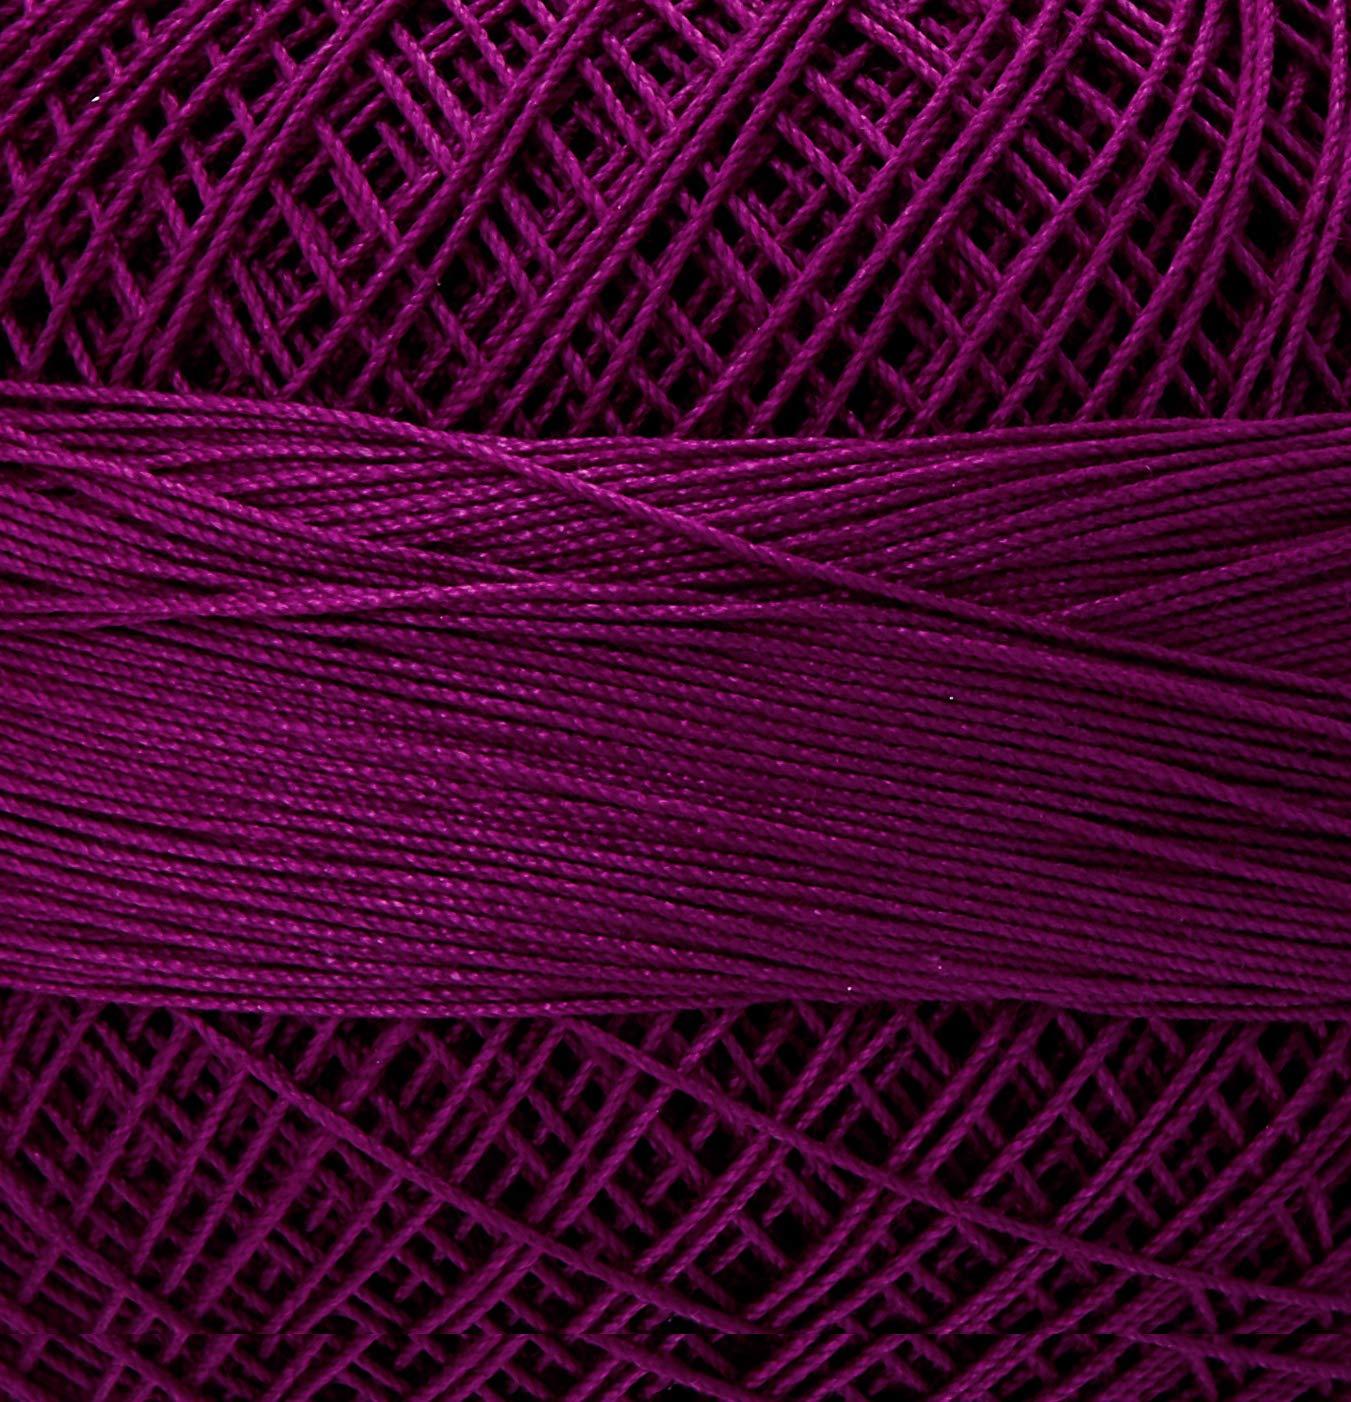 Handy Hands HH10-644 Embroidery Lizbeth Cordonnet Cotton Size 10-Dark Boysenberry